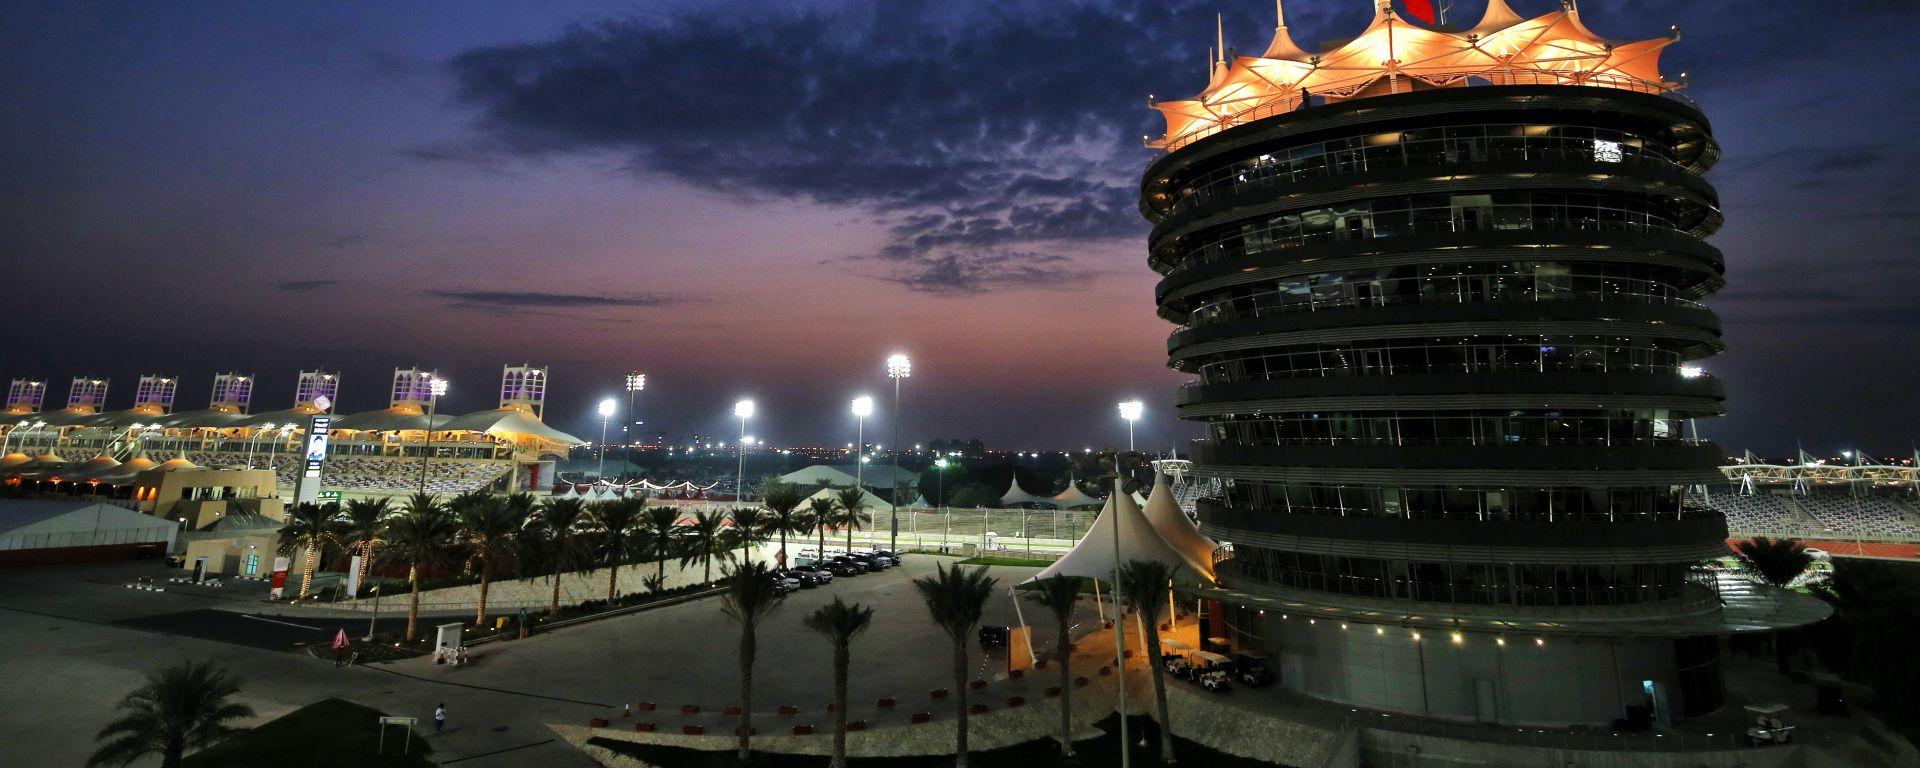 F1 GP Bahrain 2020, Sakhir: atmosfera del circuito